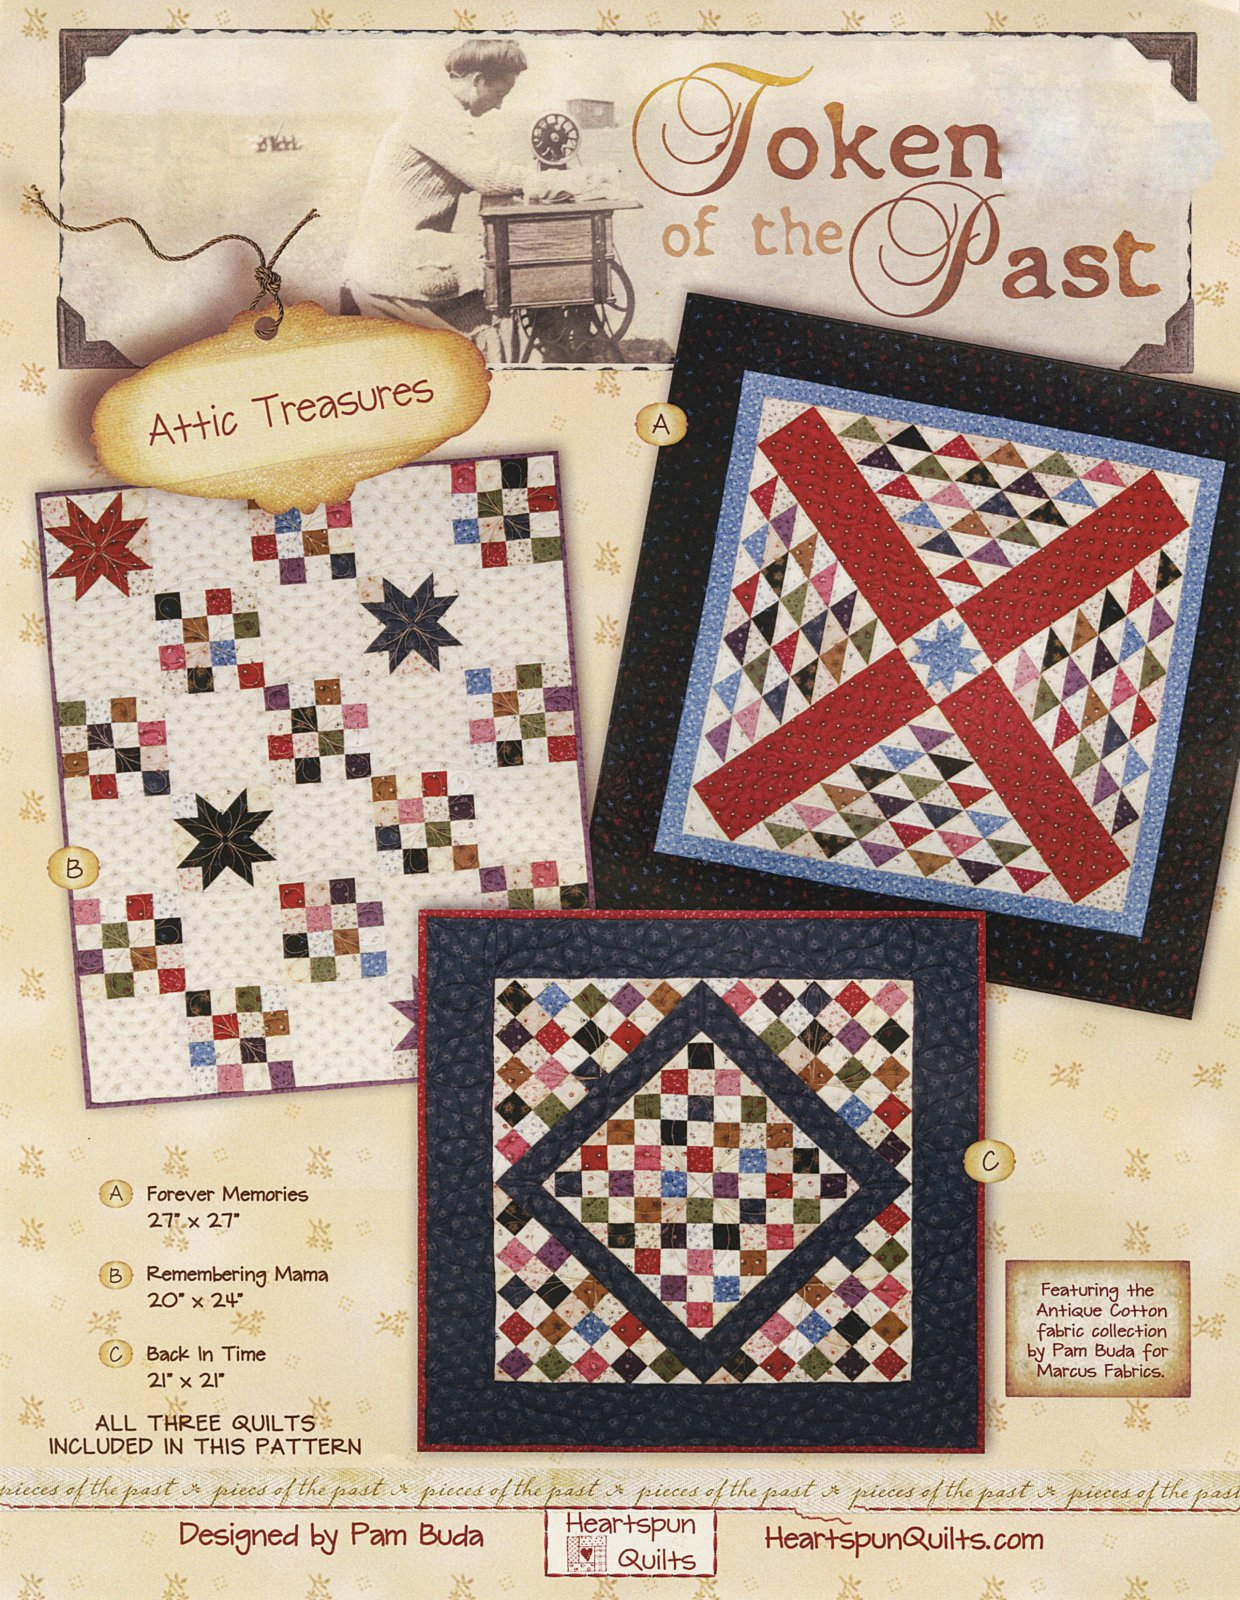 Tokens of the Past: Attic Treasures